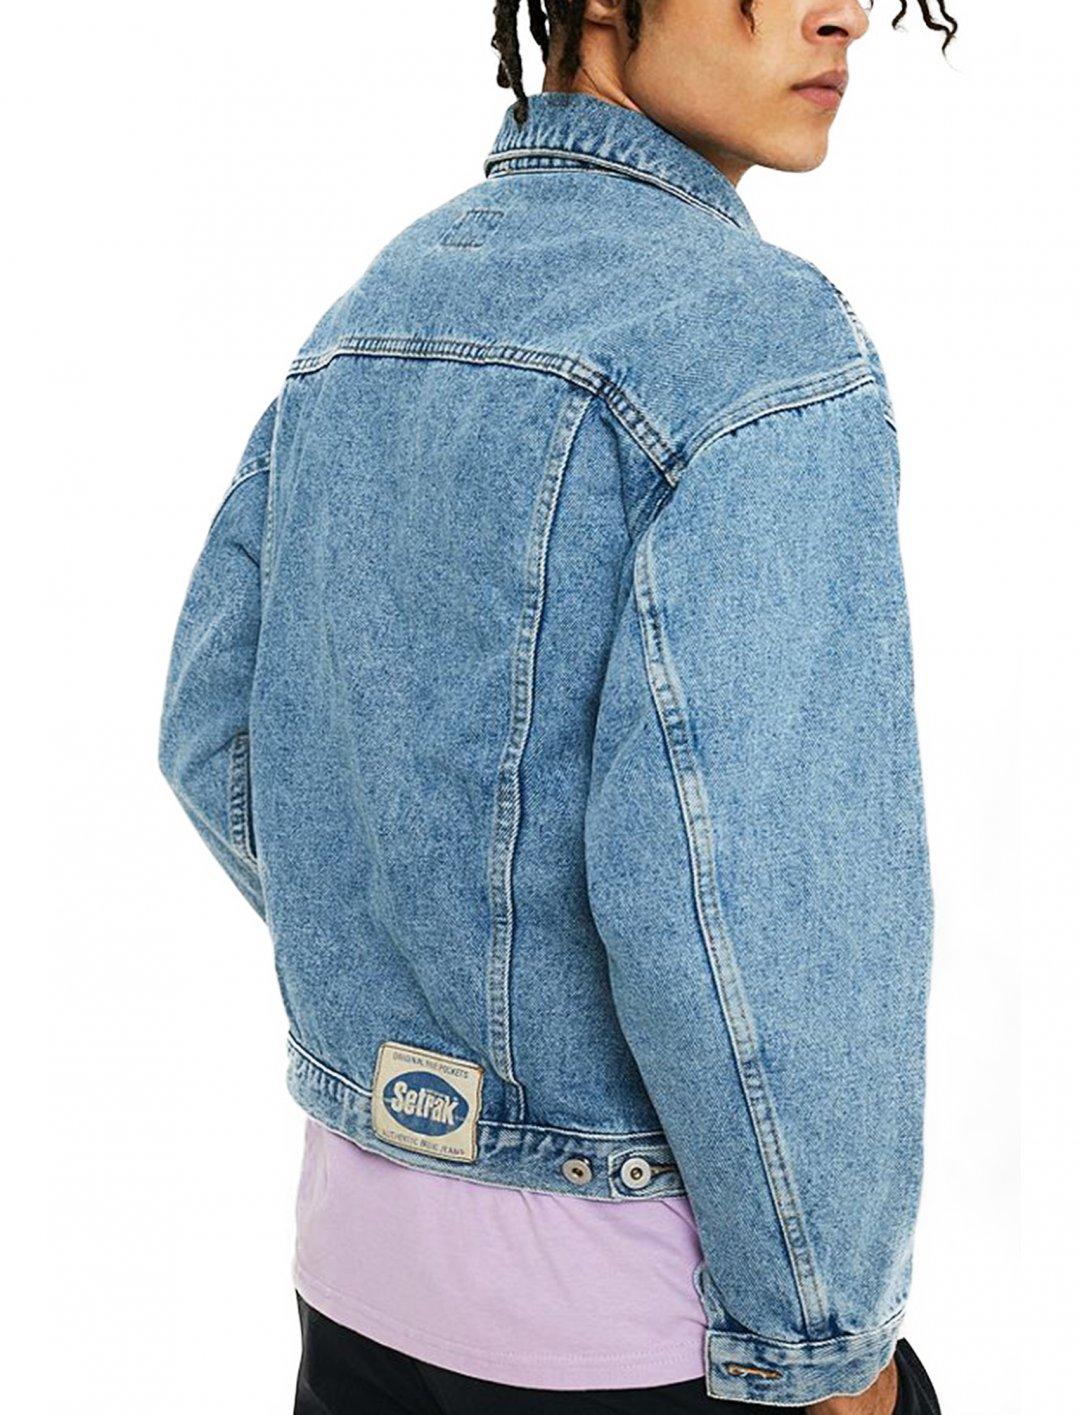 "Urban Renewal Vintage Jacket {""id"":5,""product_section_id"":1,""name"":""Clothing"",""order"":5} Urban Renewal Vintage"